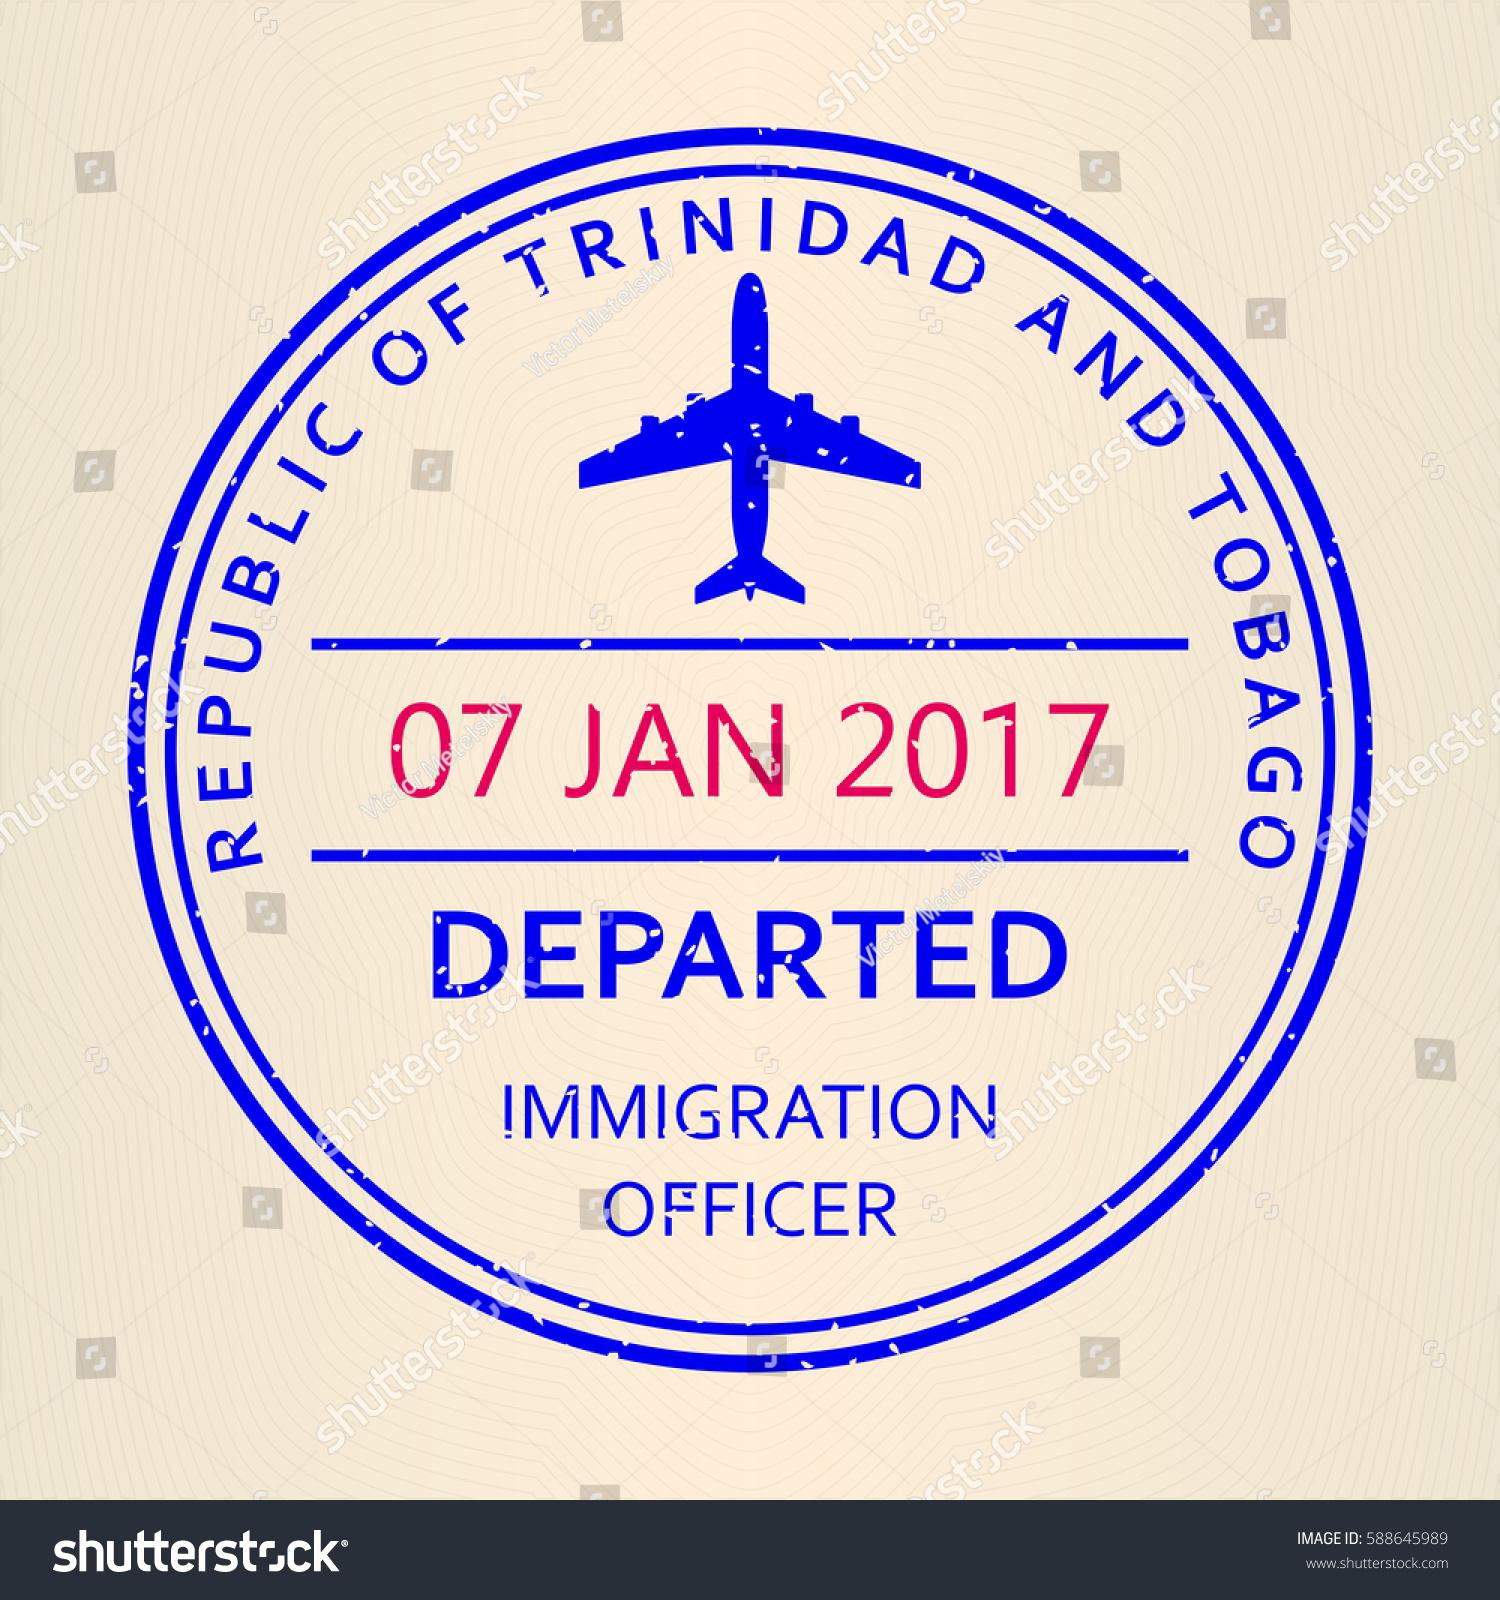 Passport stamp travel by plane visa stock vector 588645989 travel by plane visa or immigration stamp vector illustration biocorpaavc Choice Image